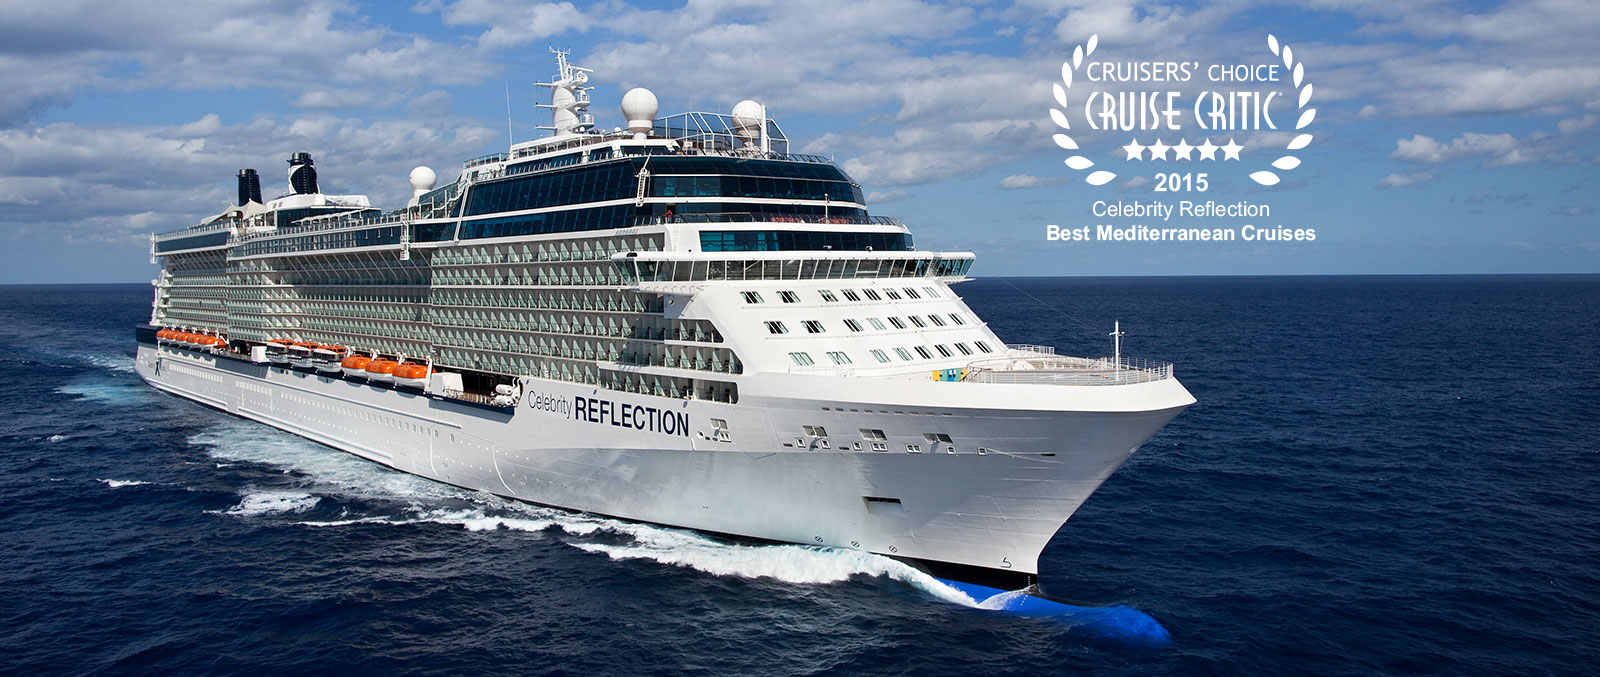 celebrity cruises greek islands 2016 news celebrity